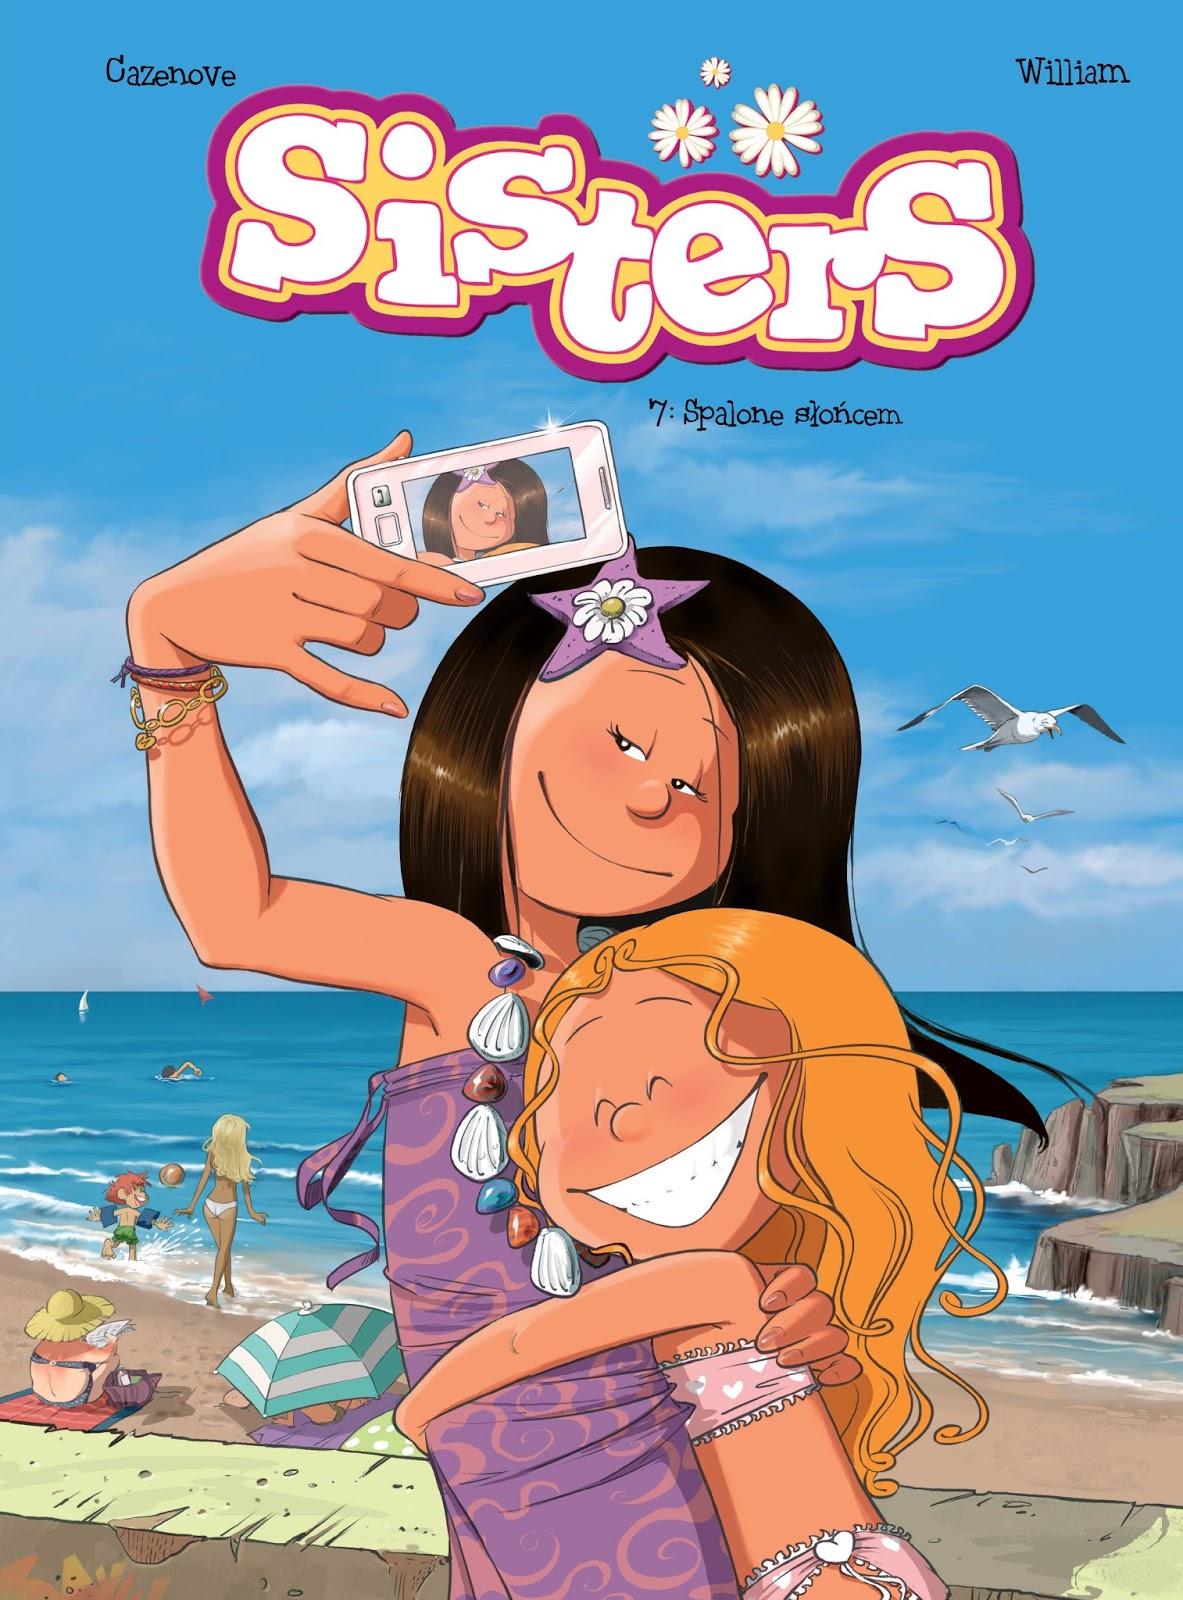 Siostry Na Wczasach Sisters 7 Spalone Sloncem Recenzja